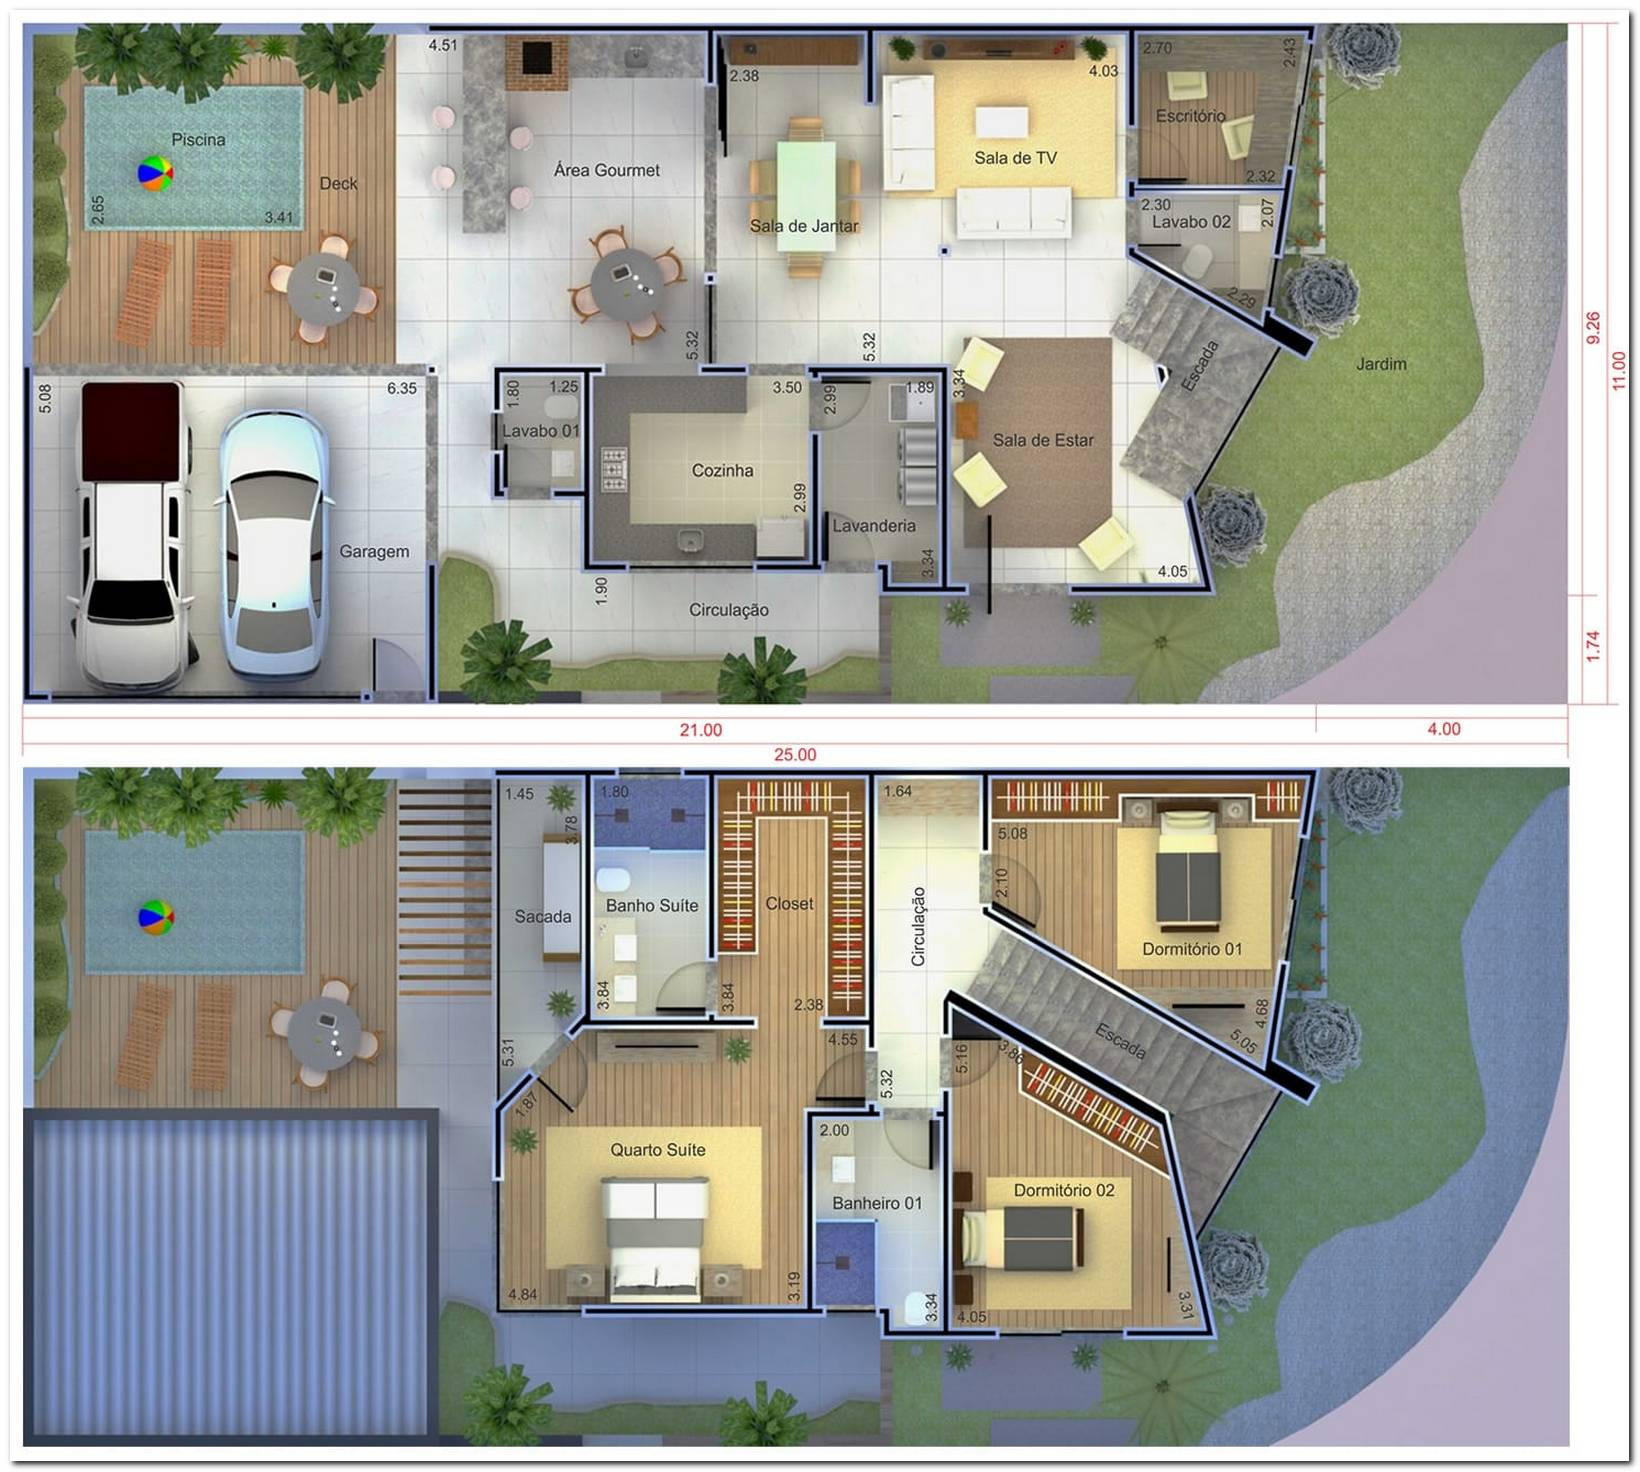 45 Casas De Esquina Fachadas Projetos E Plantas Incríveis